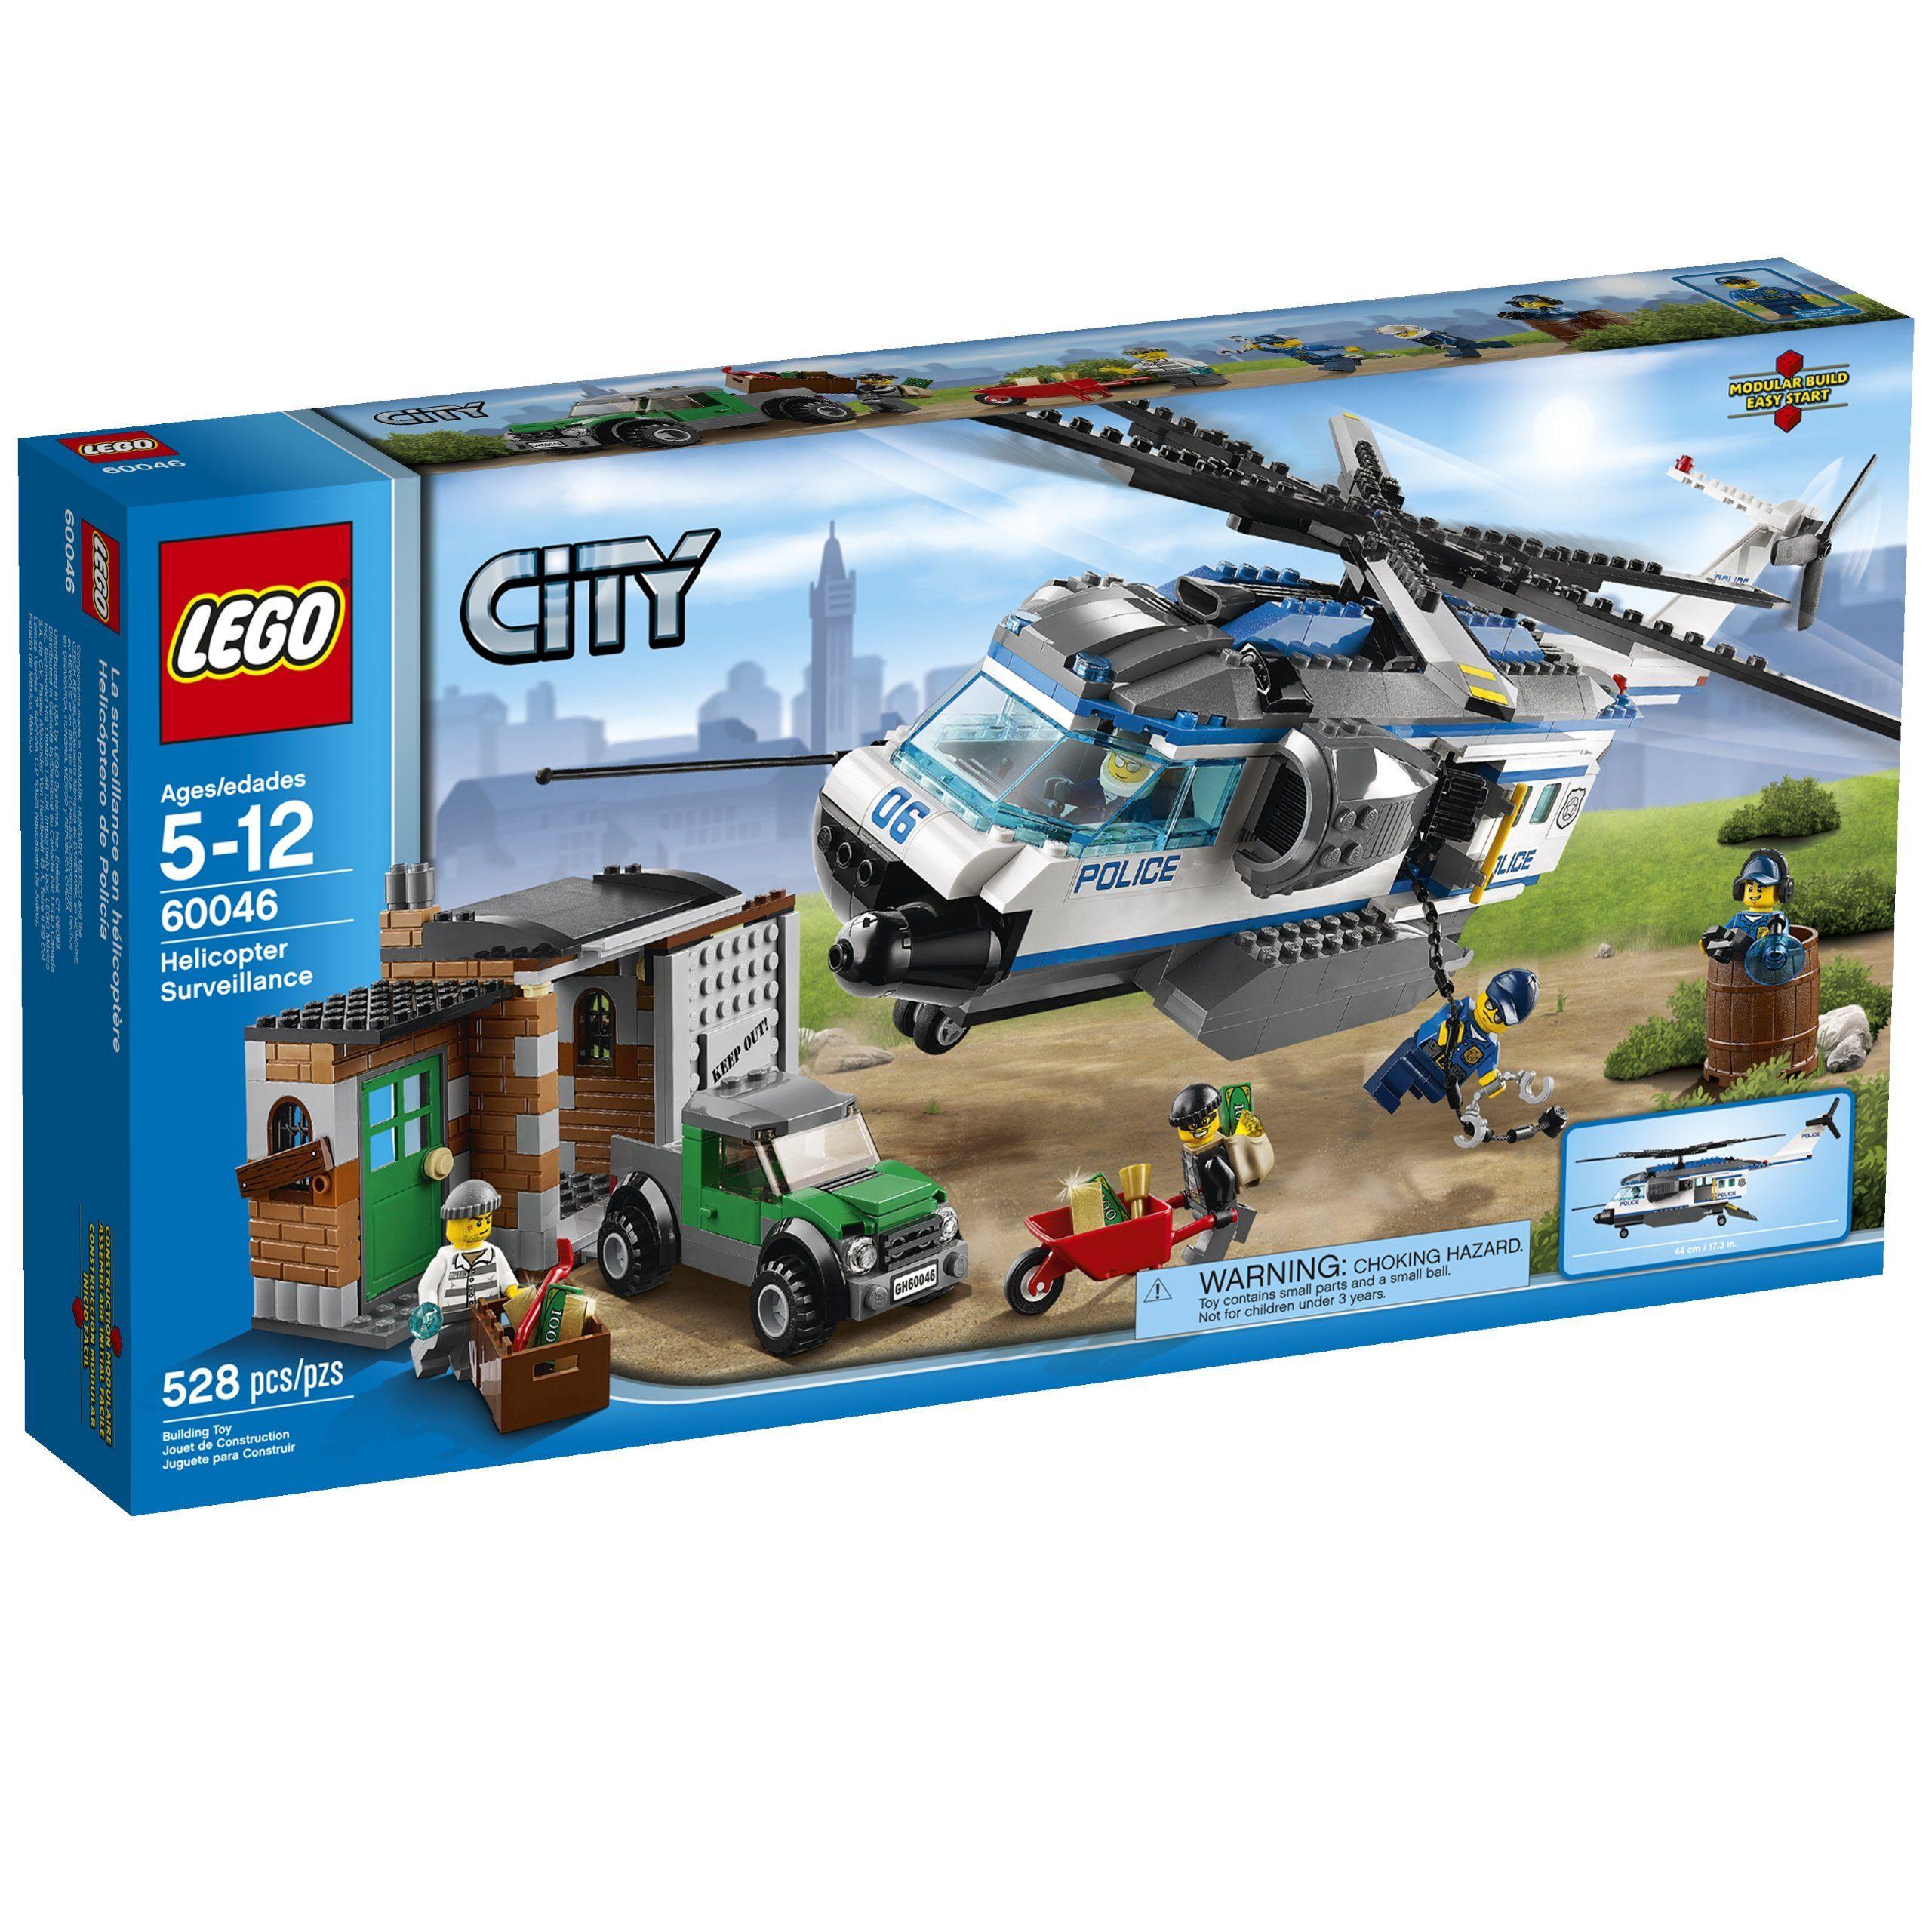 Lego City Police 60046 Helicopter Surveillance Lego City Police Lego City Helicopter Lego City